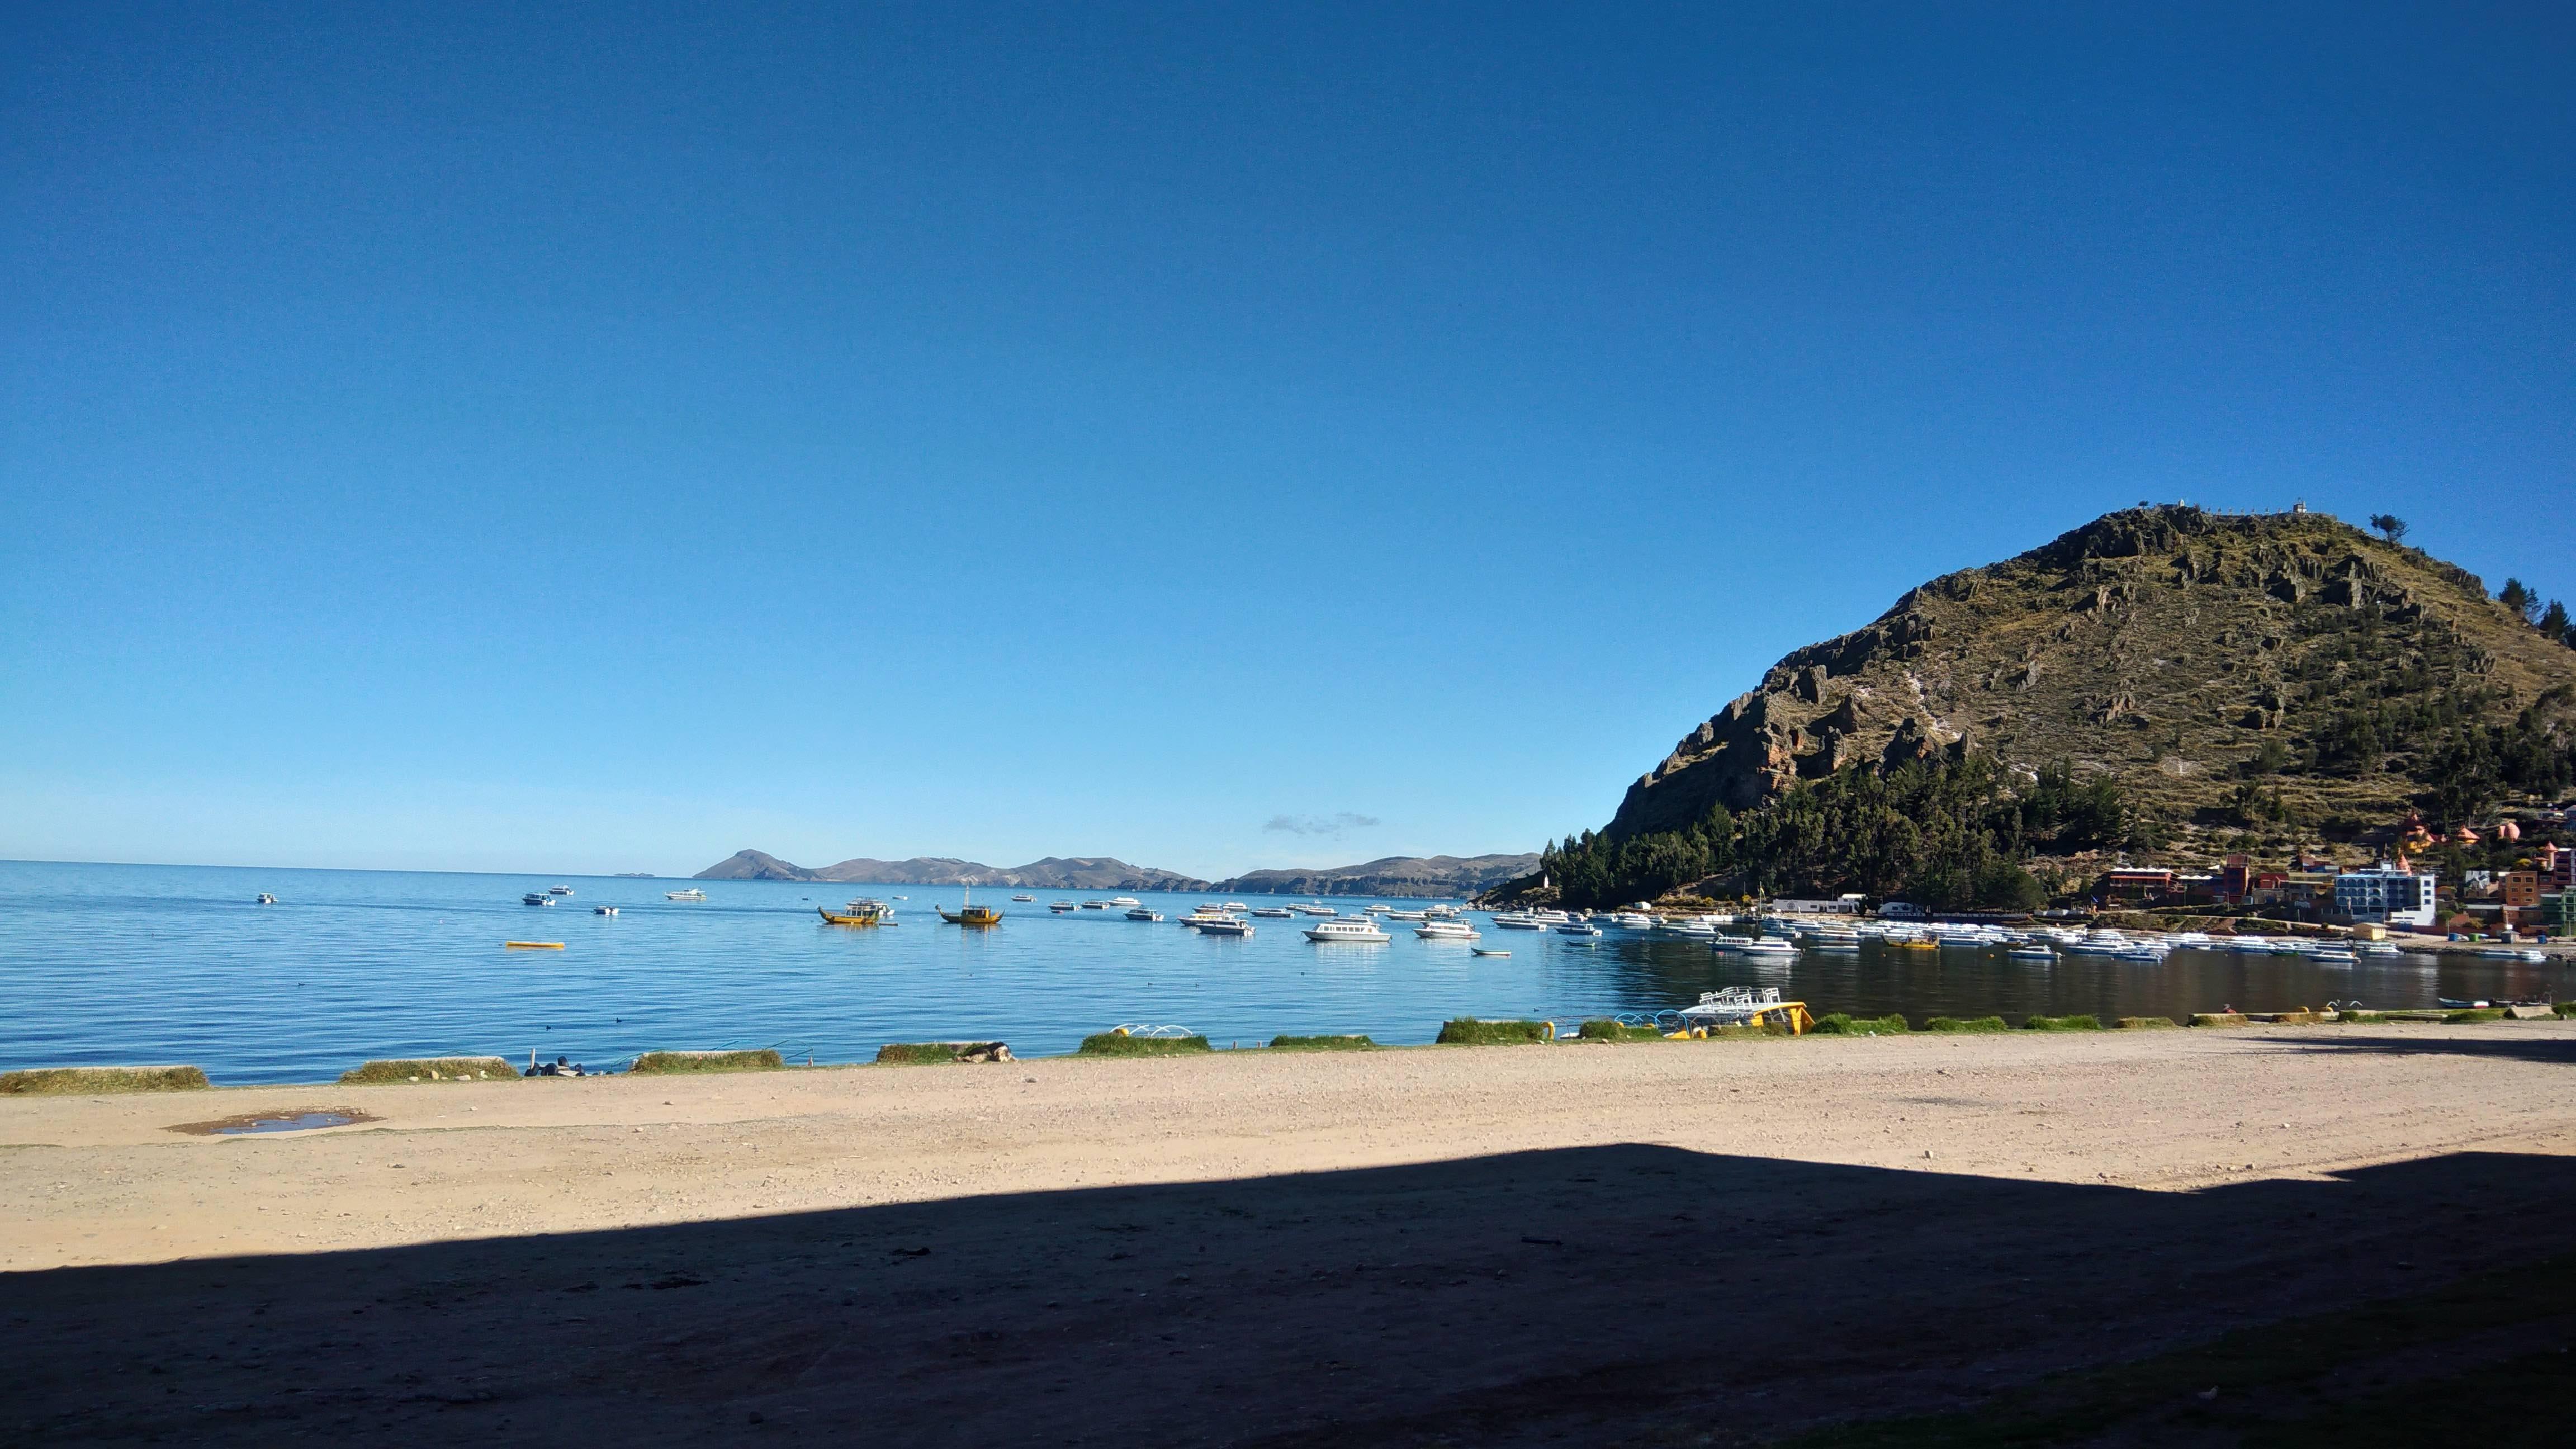 001 2011 Copacabana - Titicacasee 4jpeg